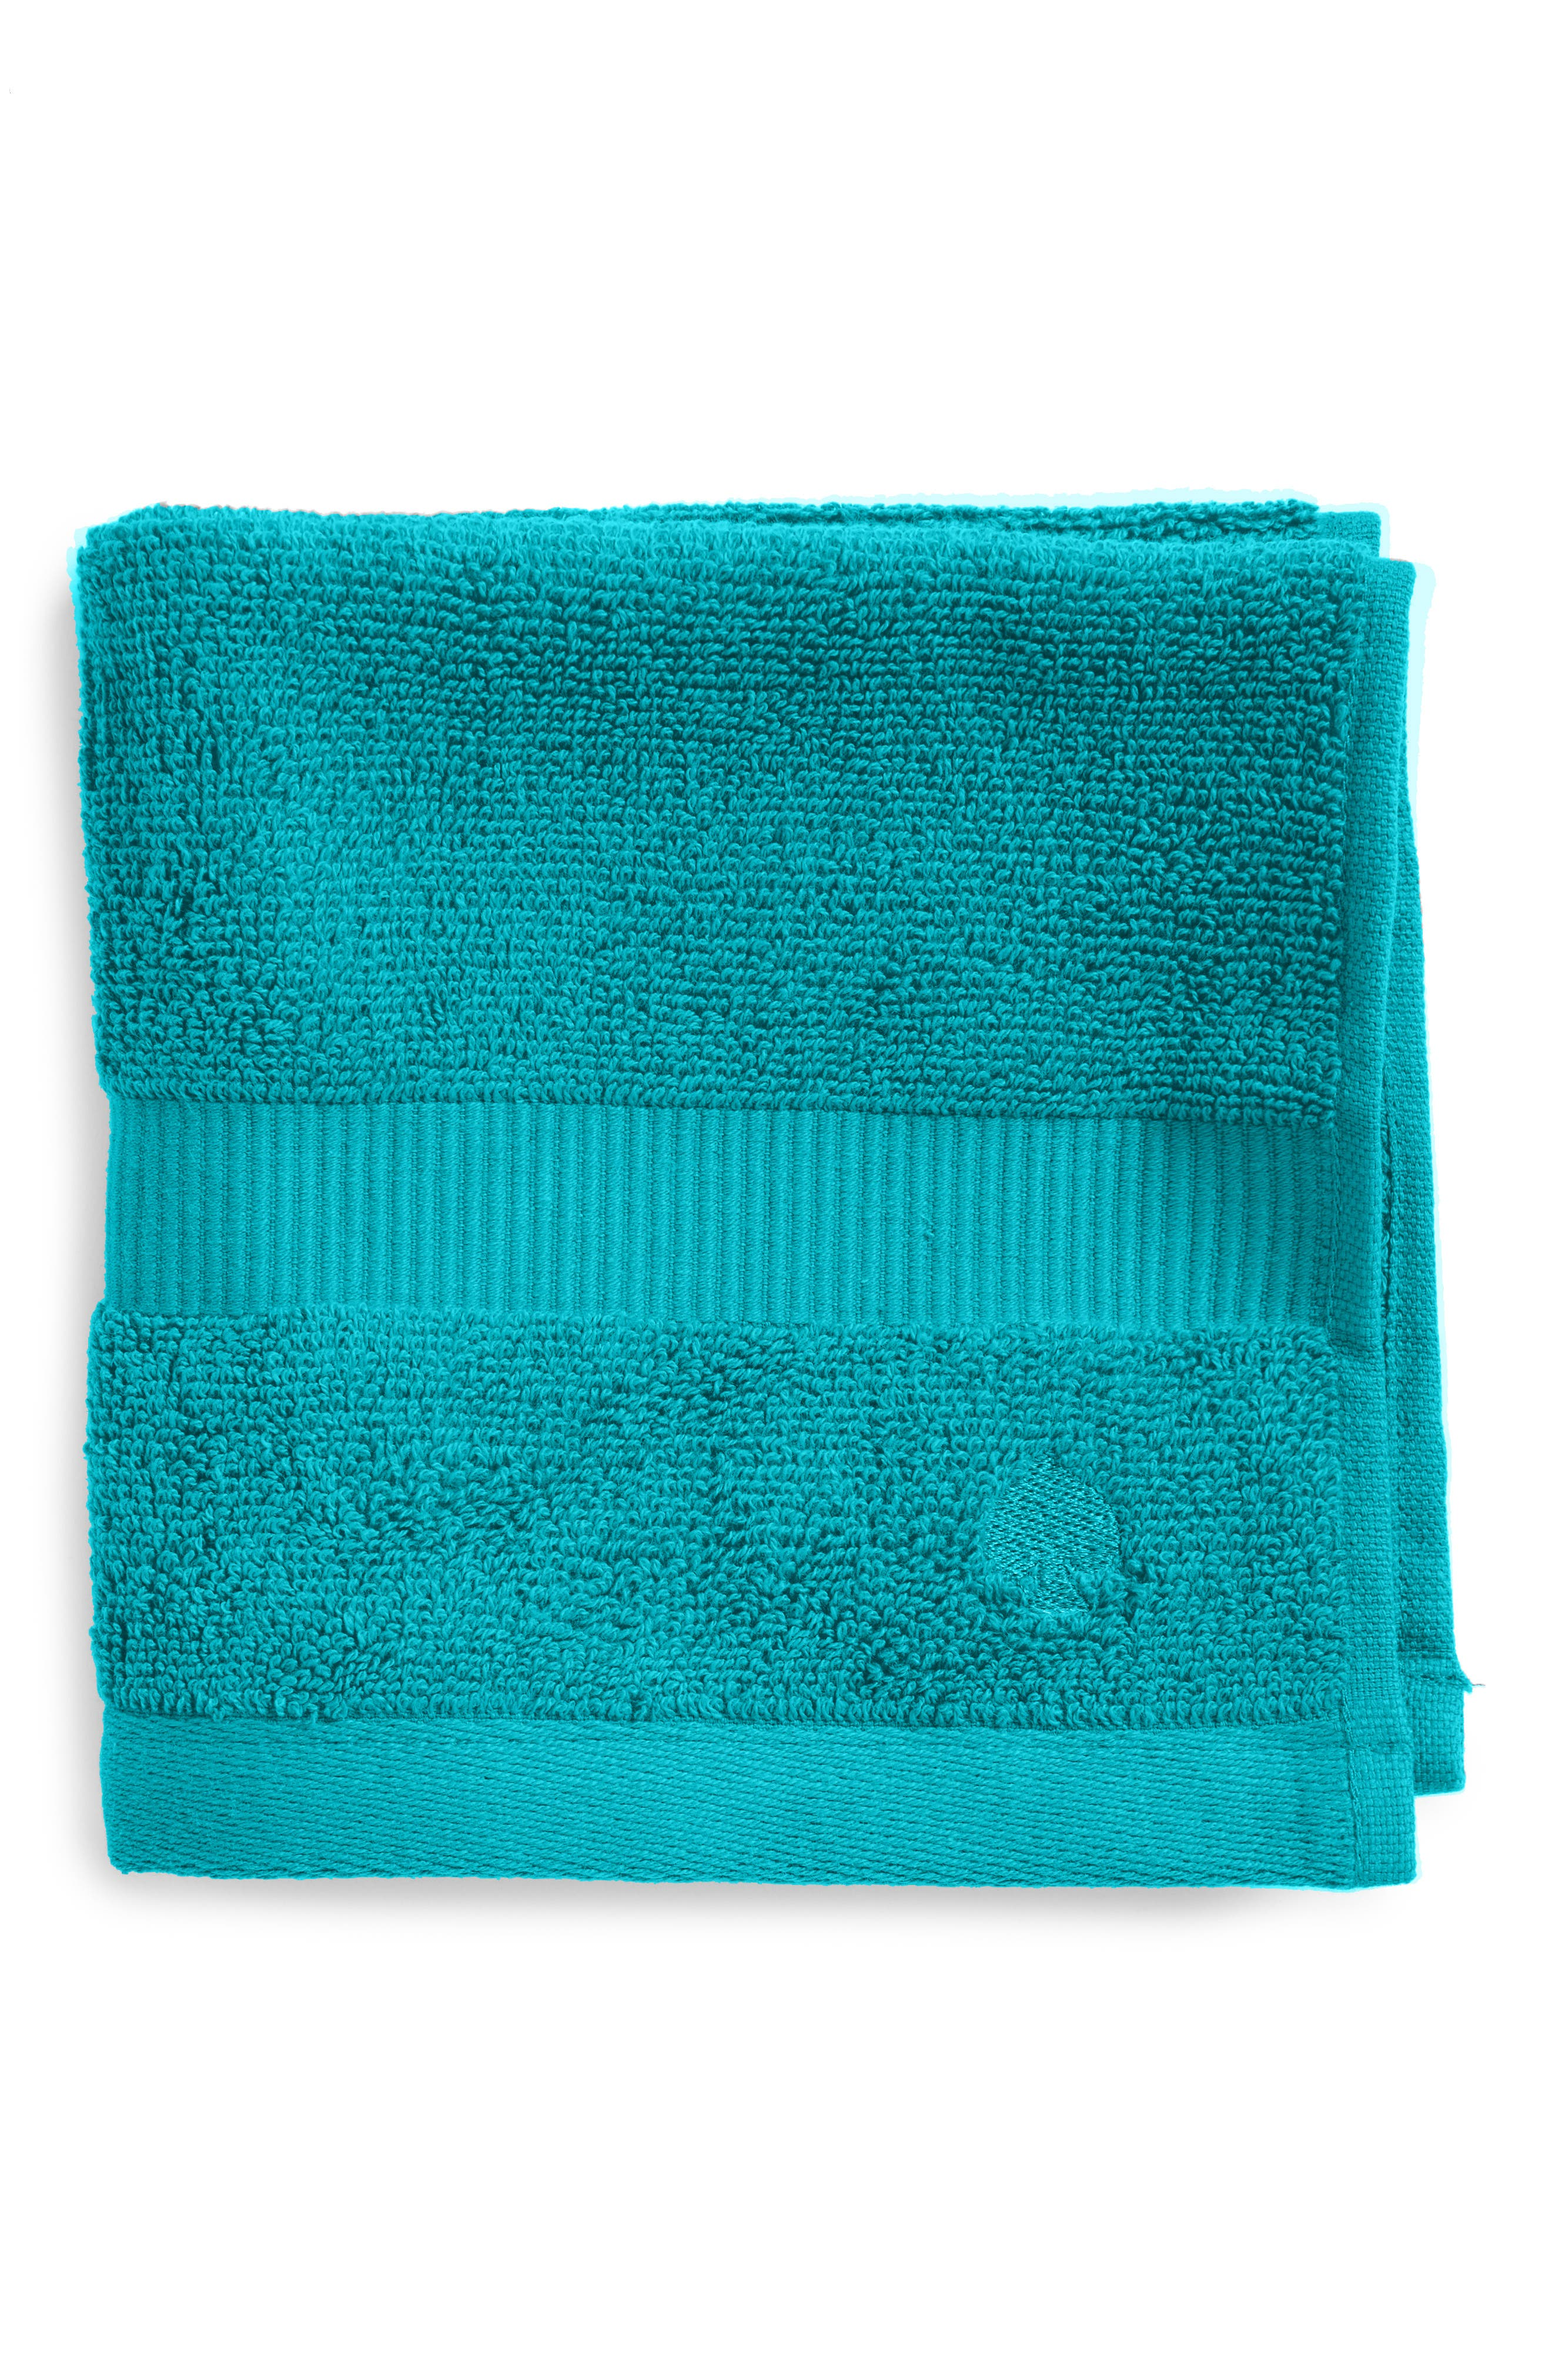 kate spade new york 'chattam stripe' wash towel